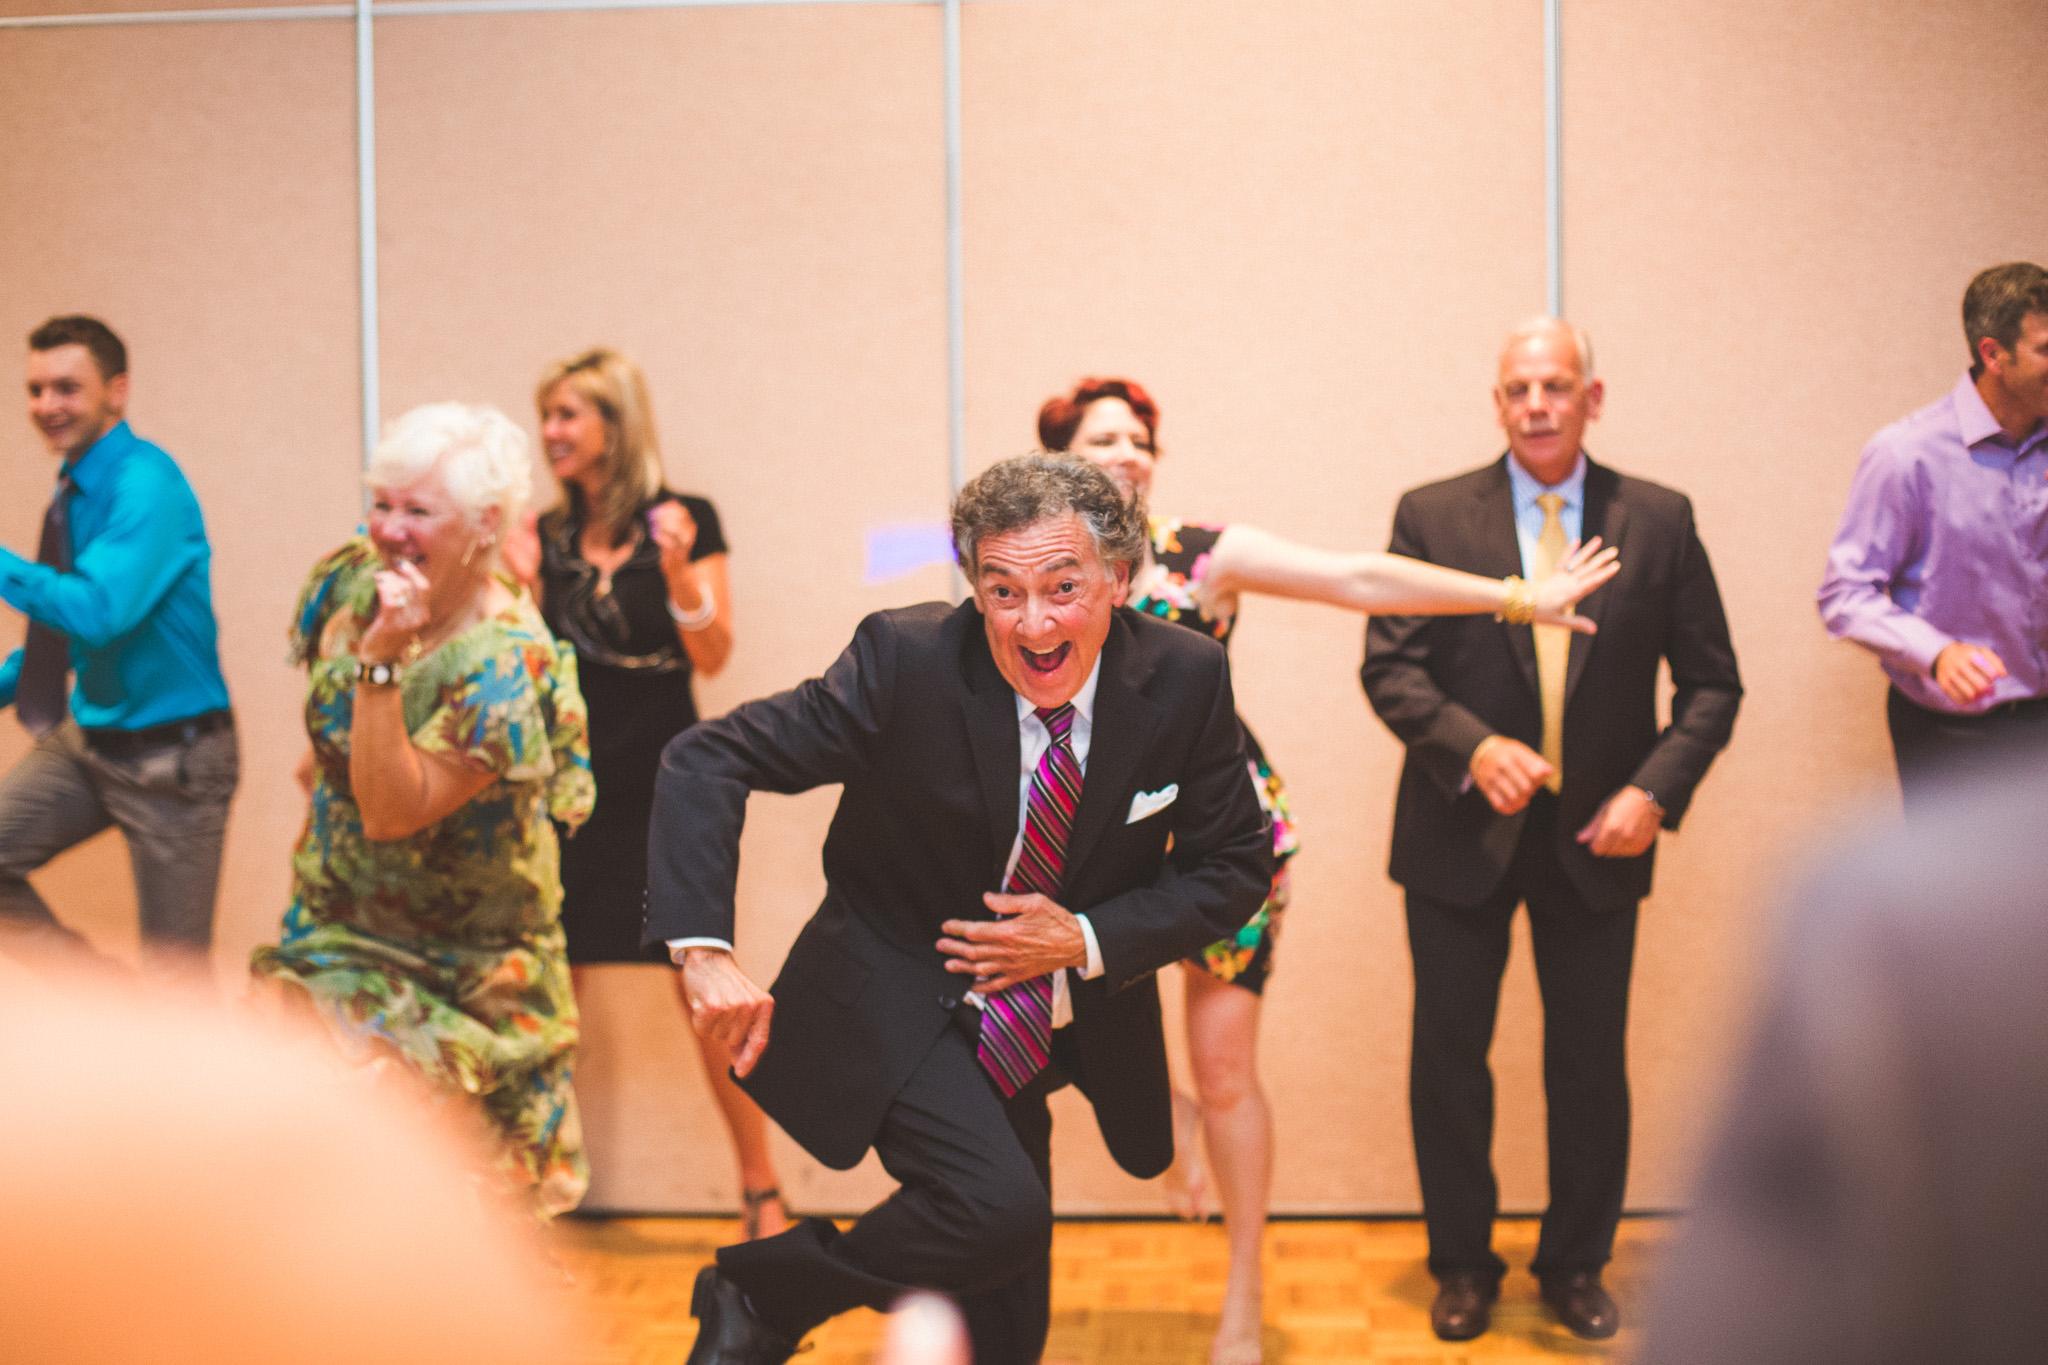 Dance-flash-mob-wedding